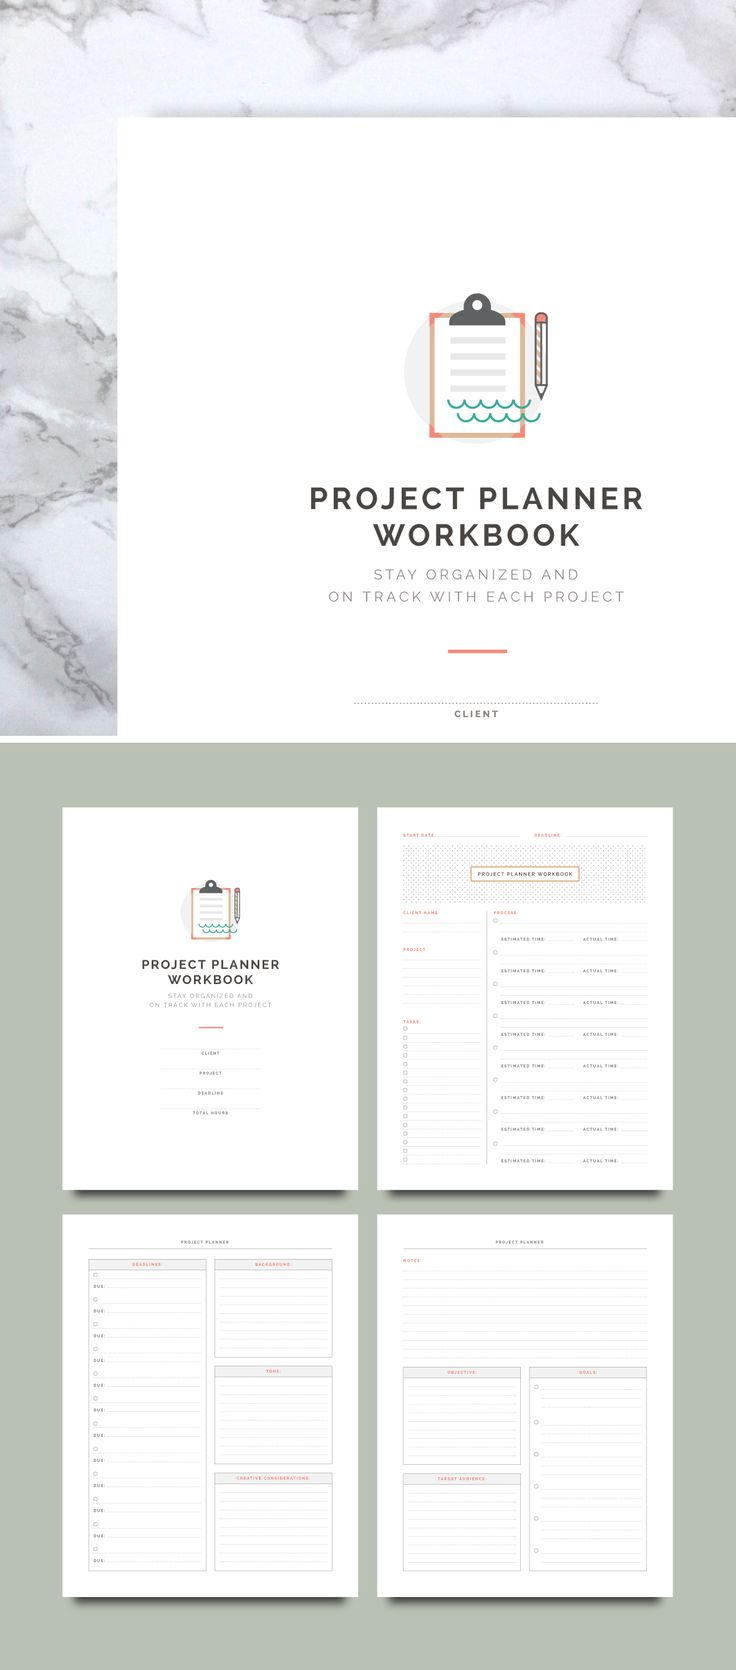 Project Planner Worksheets   Spruce Rd. for Elle & Co